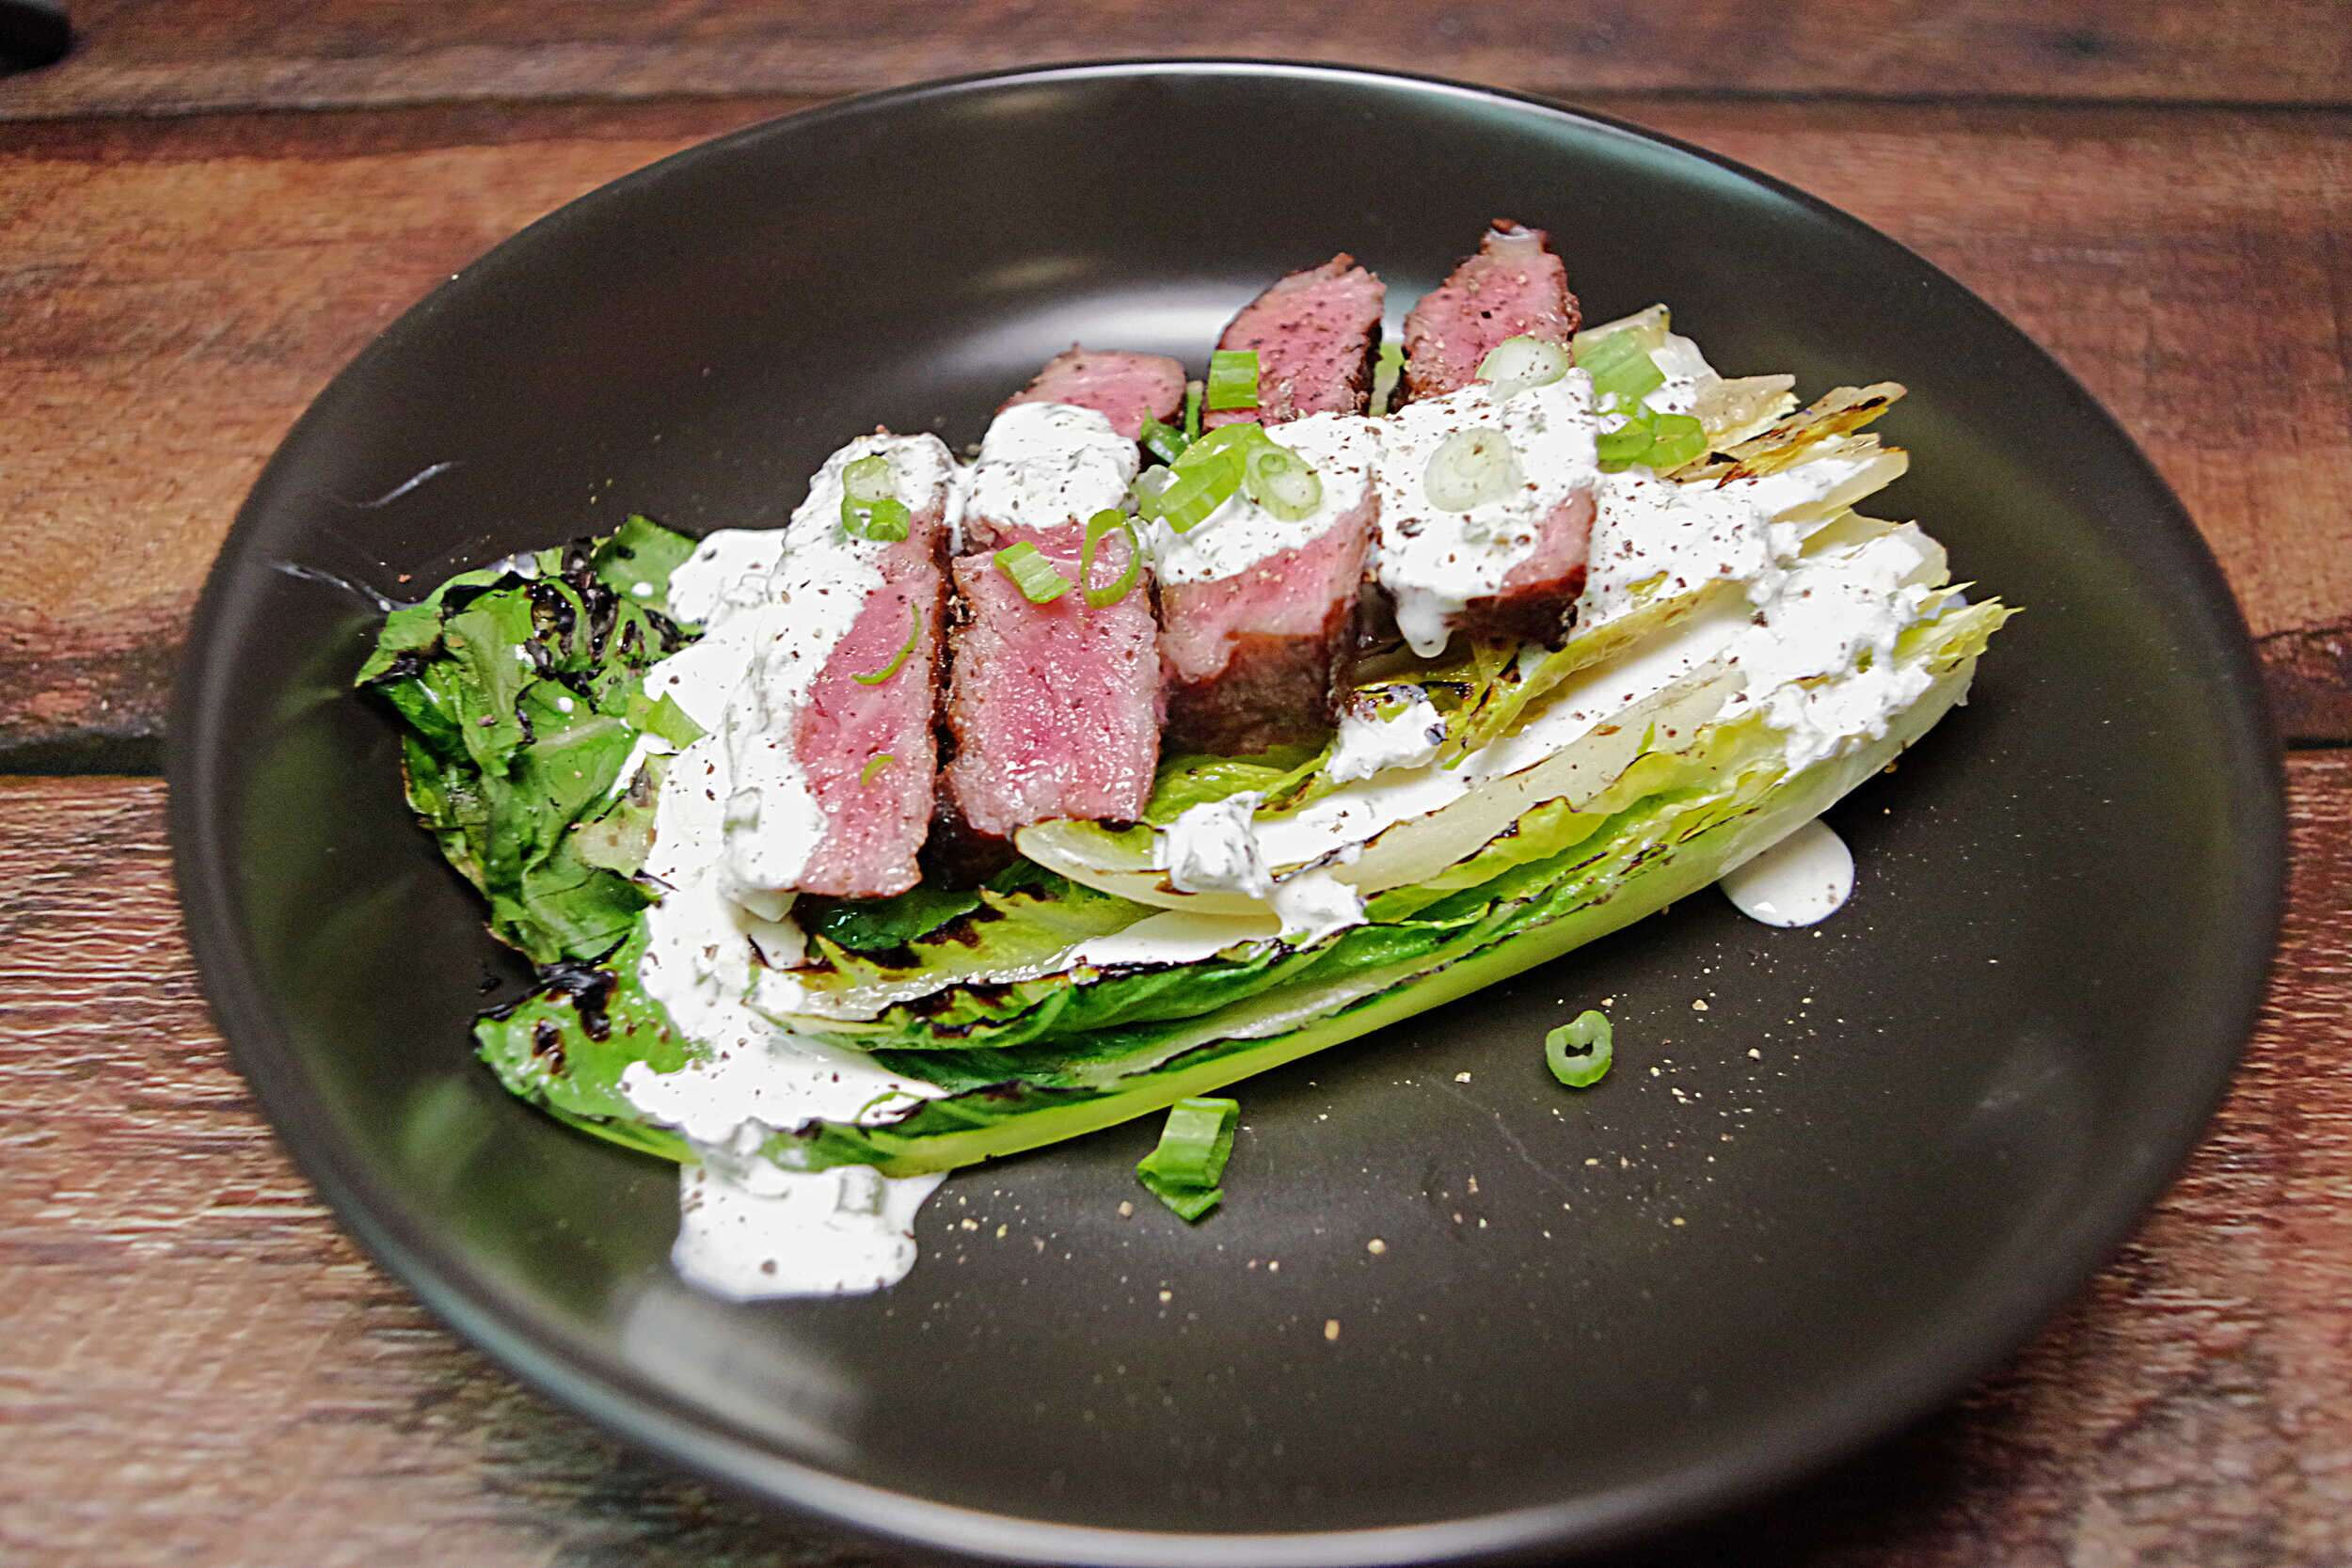 Grilled Romaine Steak Salad & Horseradish Dressing